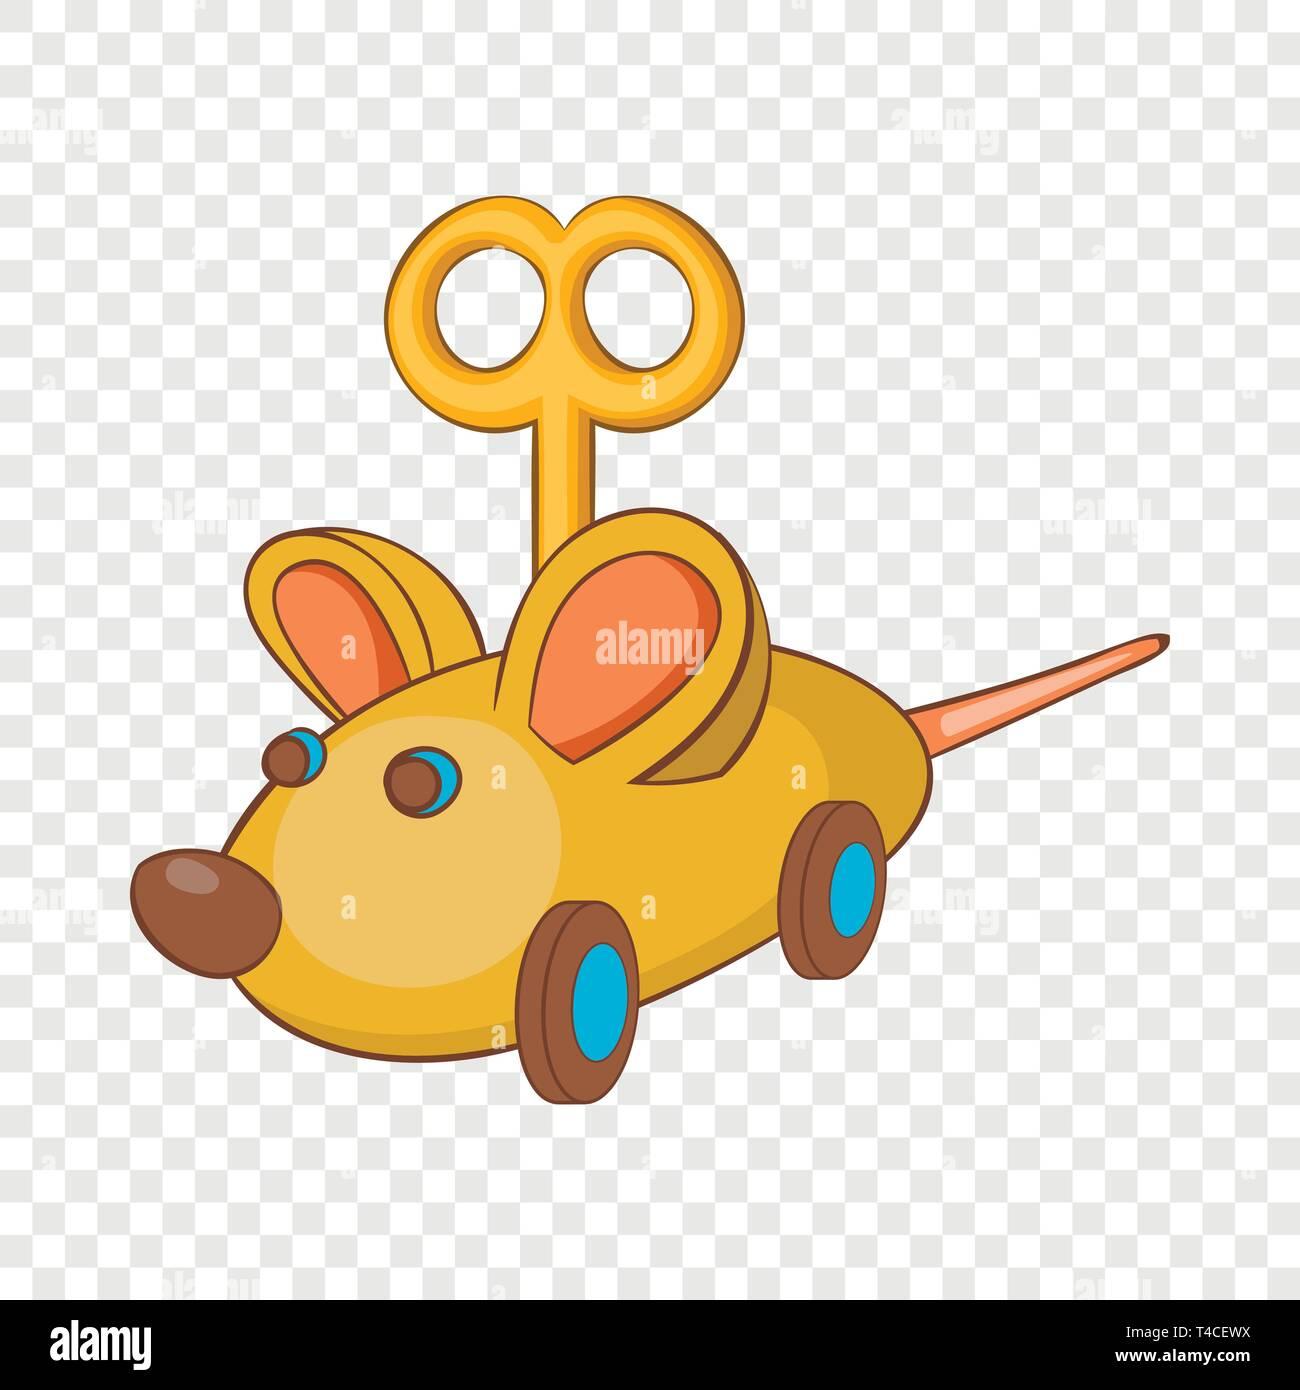 Clockwork mouse icon, cartoon style - Stock Vector